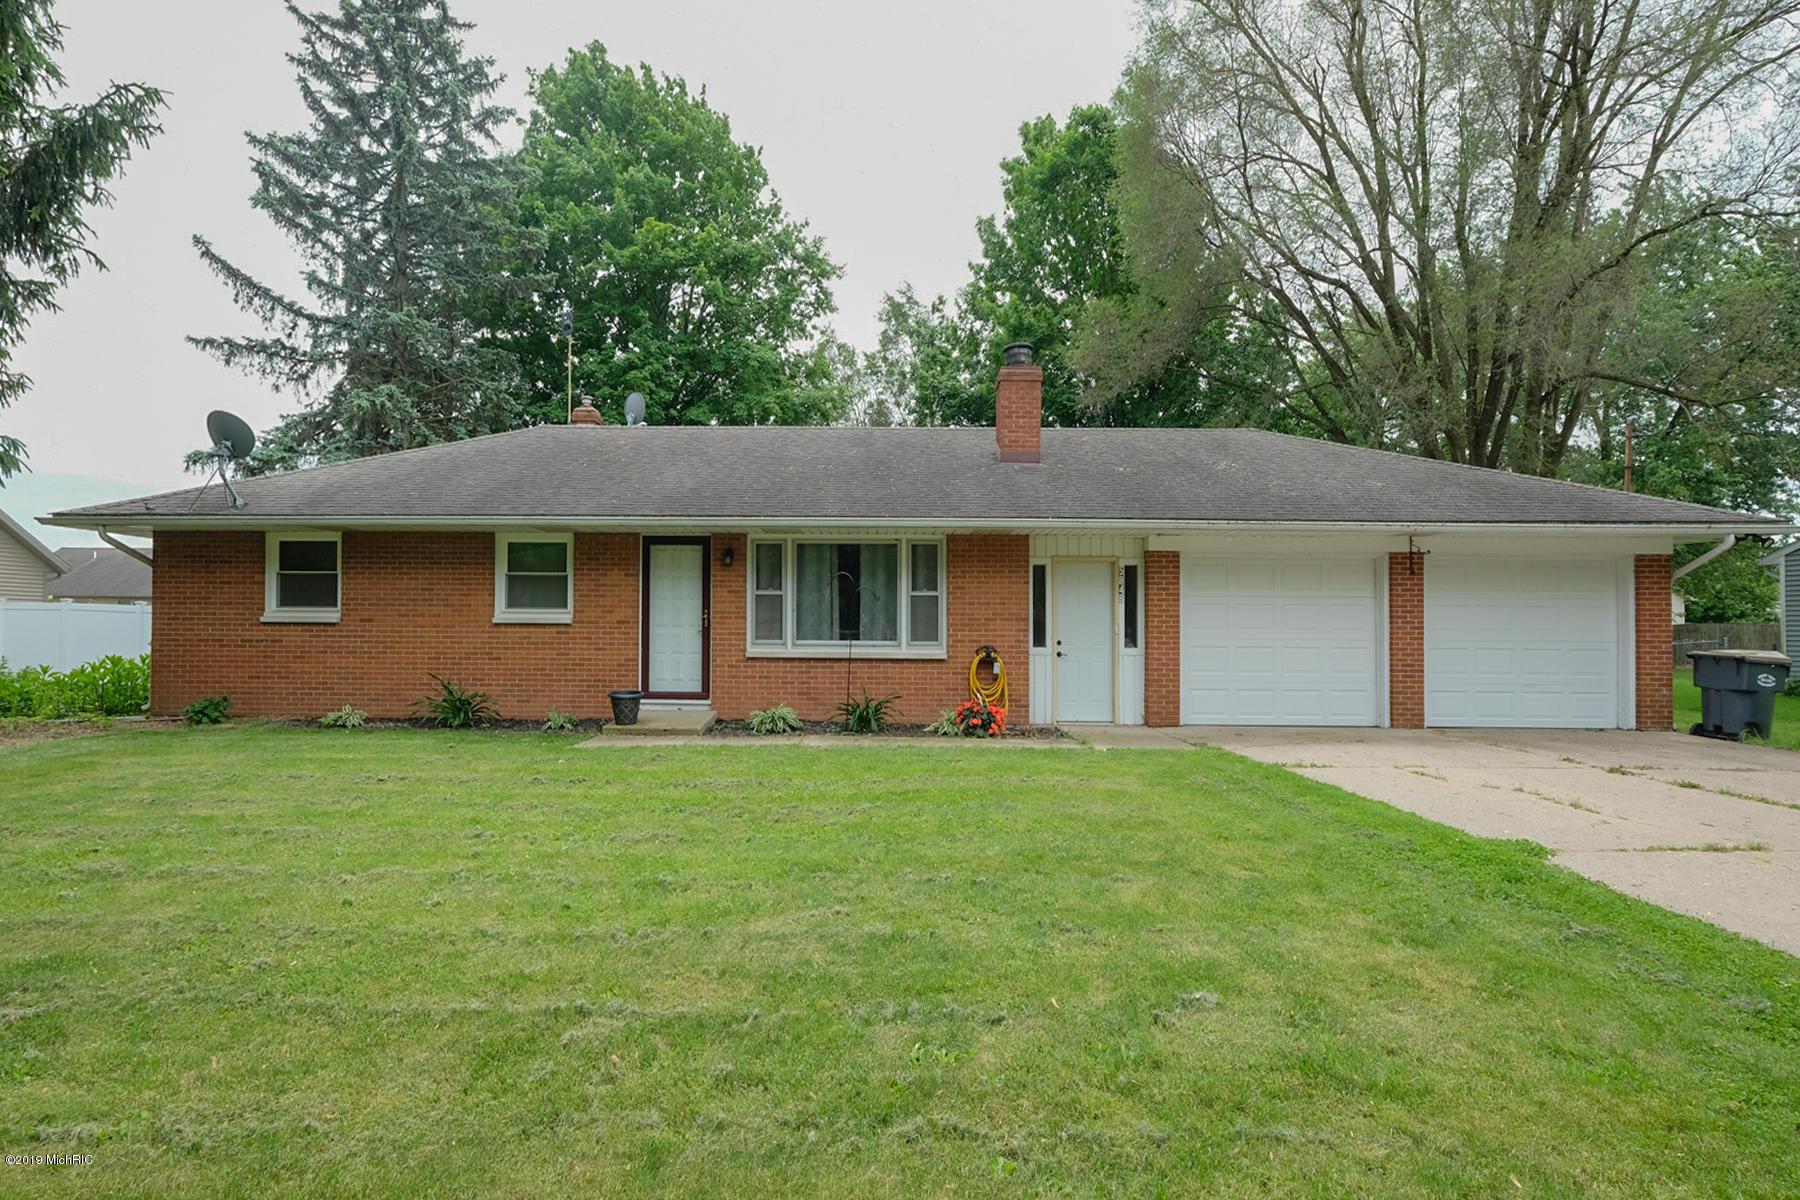 5848 LEON DRIVE, SCOTTS, MI 49088 | Midwest Properties of